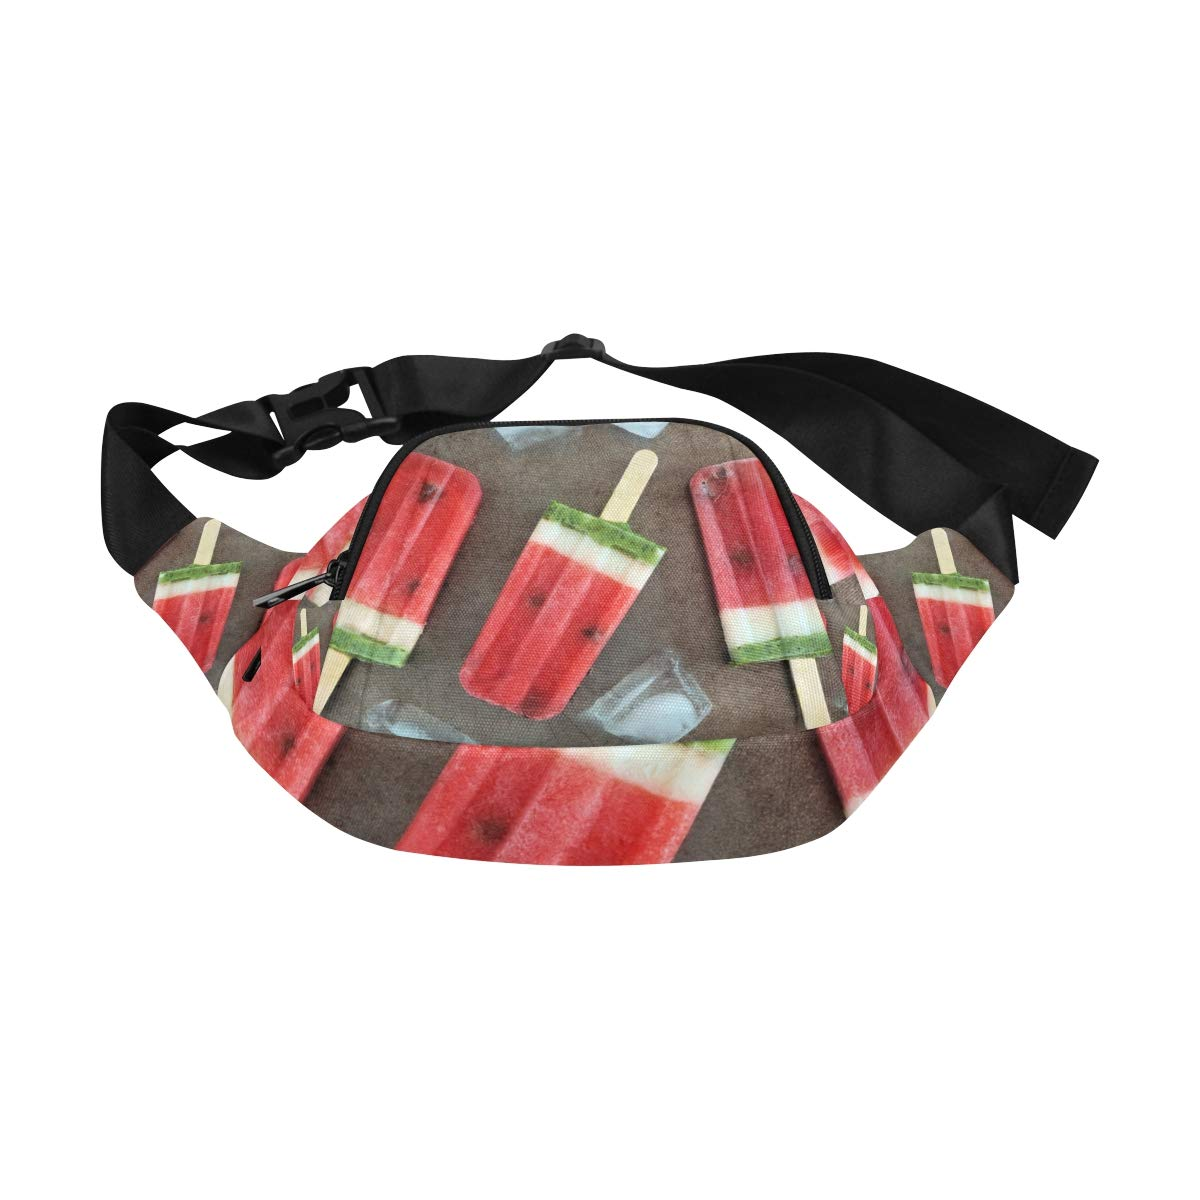 Watermelon Ice-cream On A Stick Fenny Packs Waist Bags Adjustable Belt Waterproof Nylon Travel Running Sport Vacation Party For Men Women Boys Girls Kids